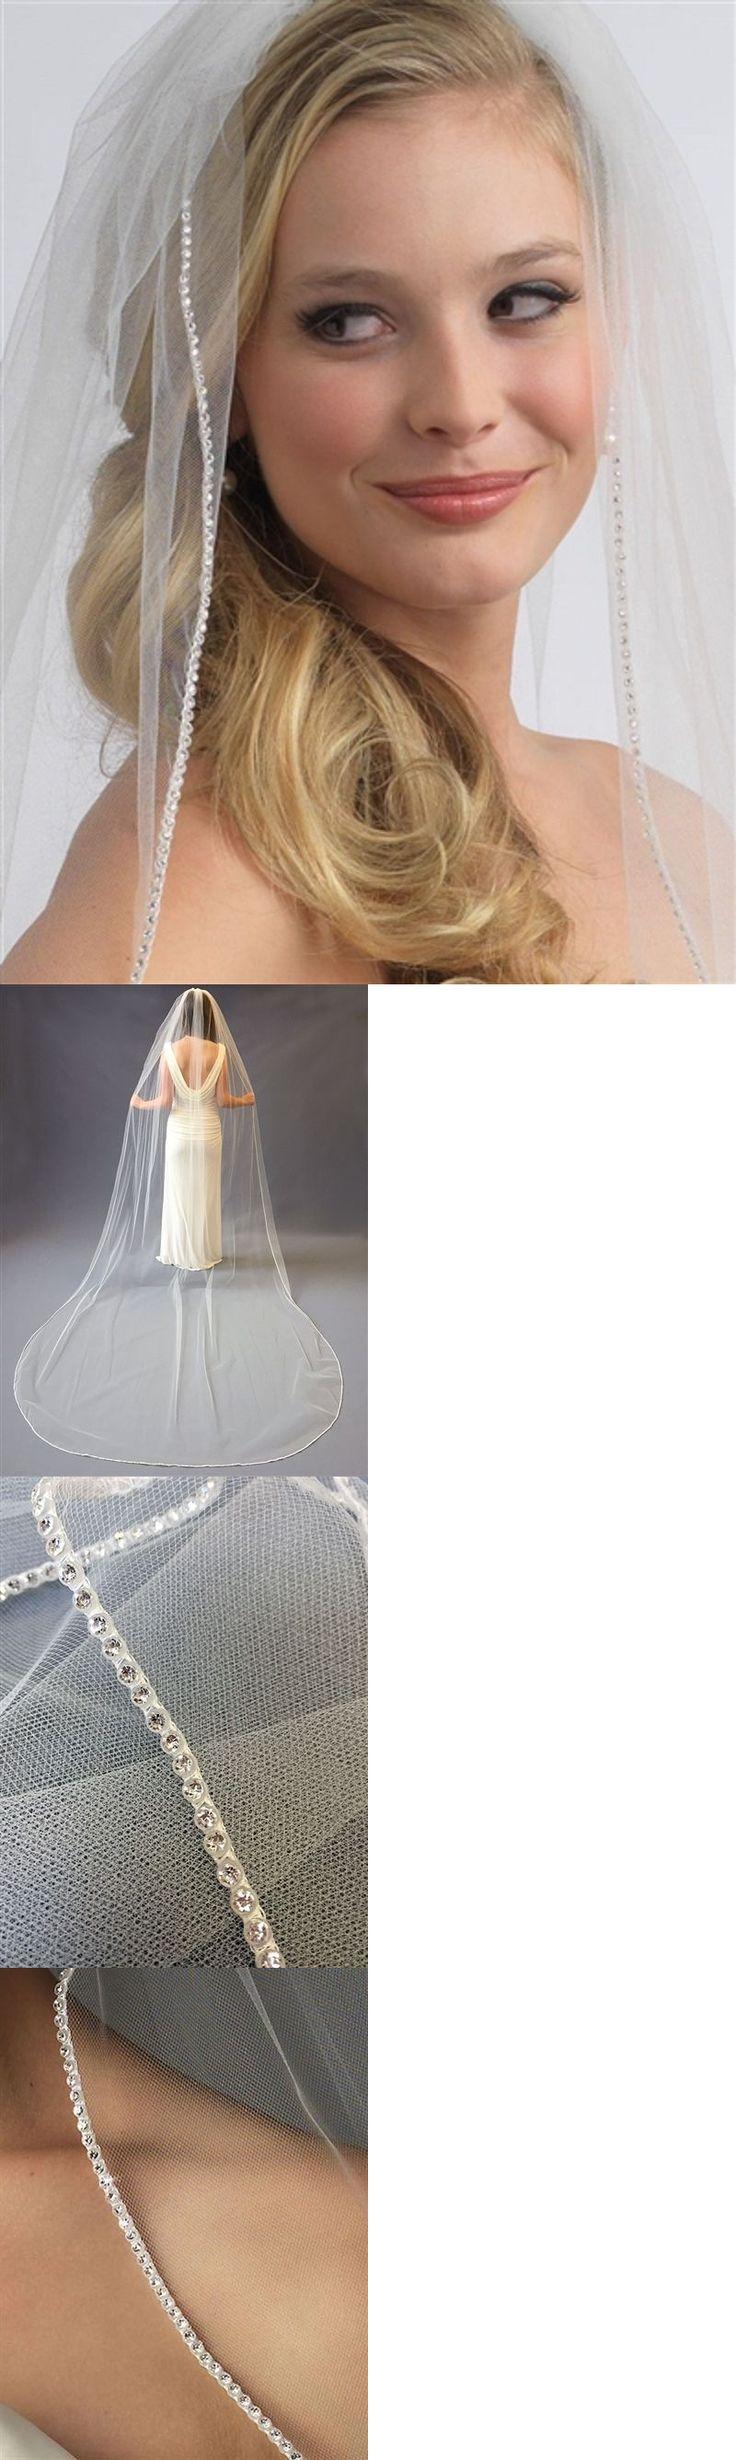 Bridal Accessories: 1-Layer, Swarovski Large Rhinestone Edge Wedding Veil Ivory 108 L -> BUY IT NOW ONLY: $49.99 on eBay!